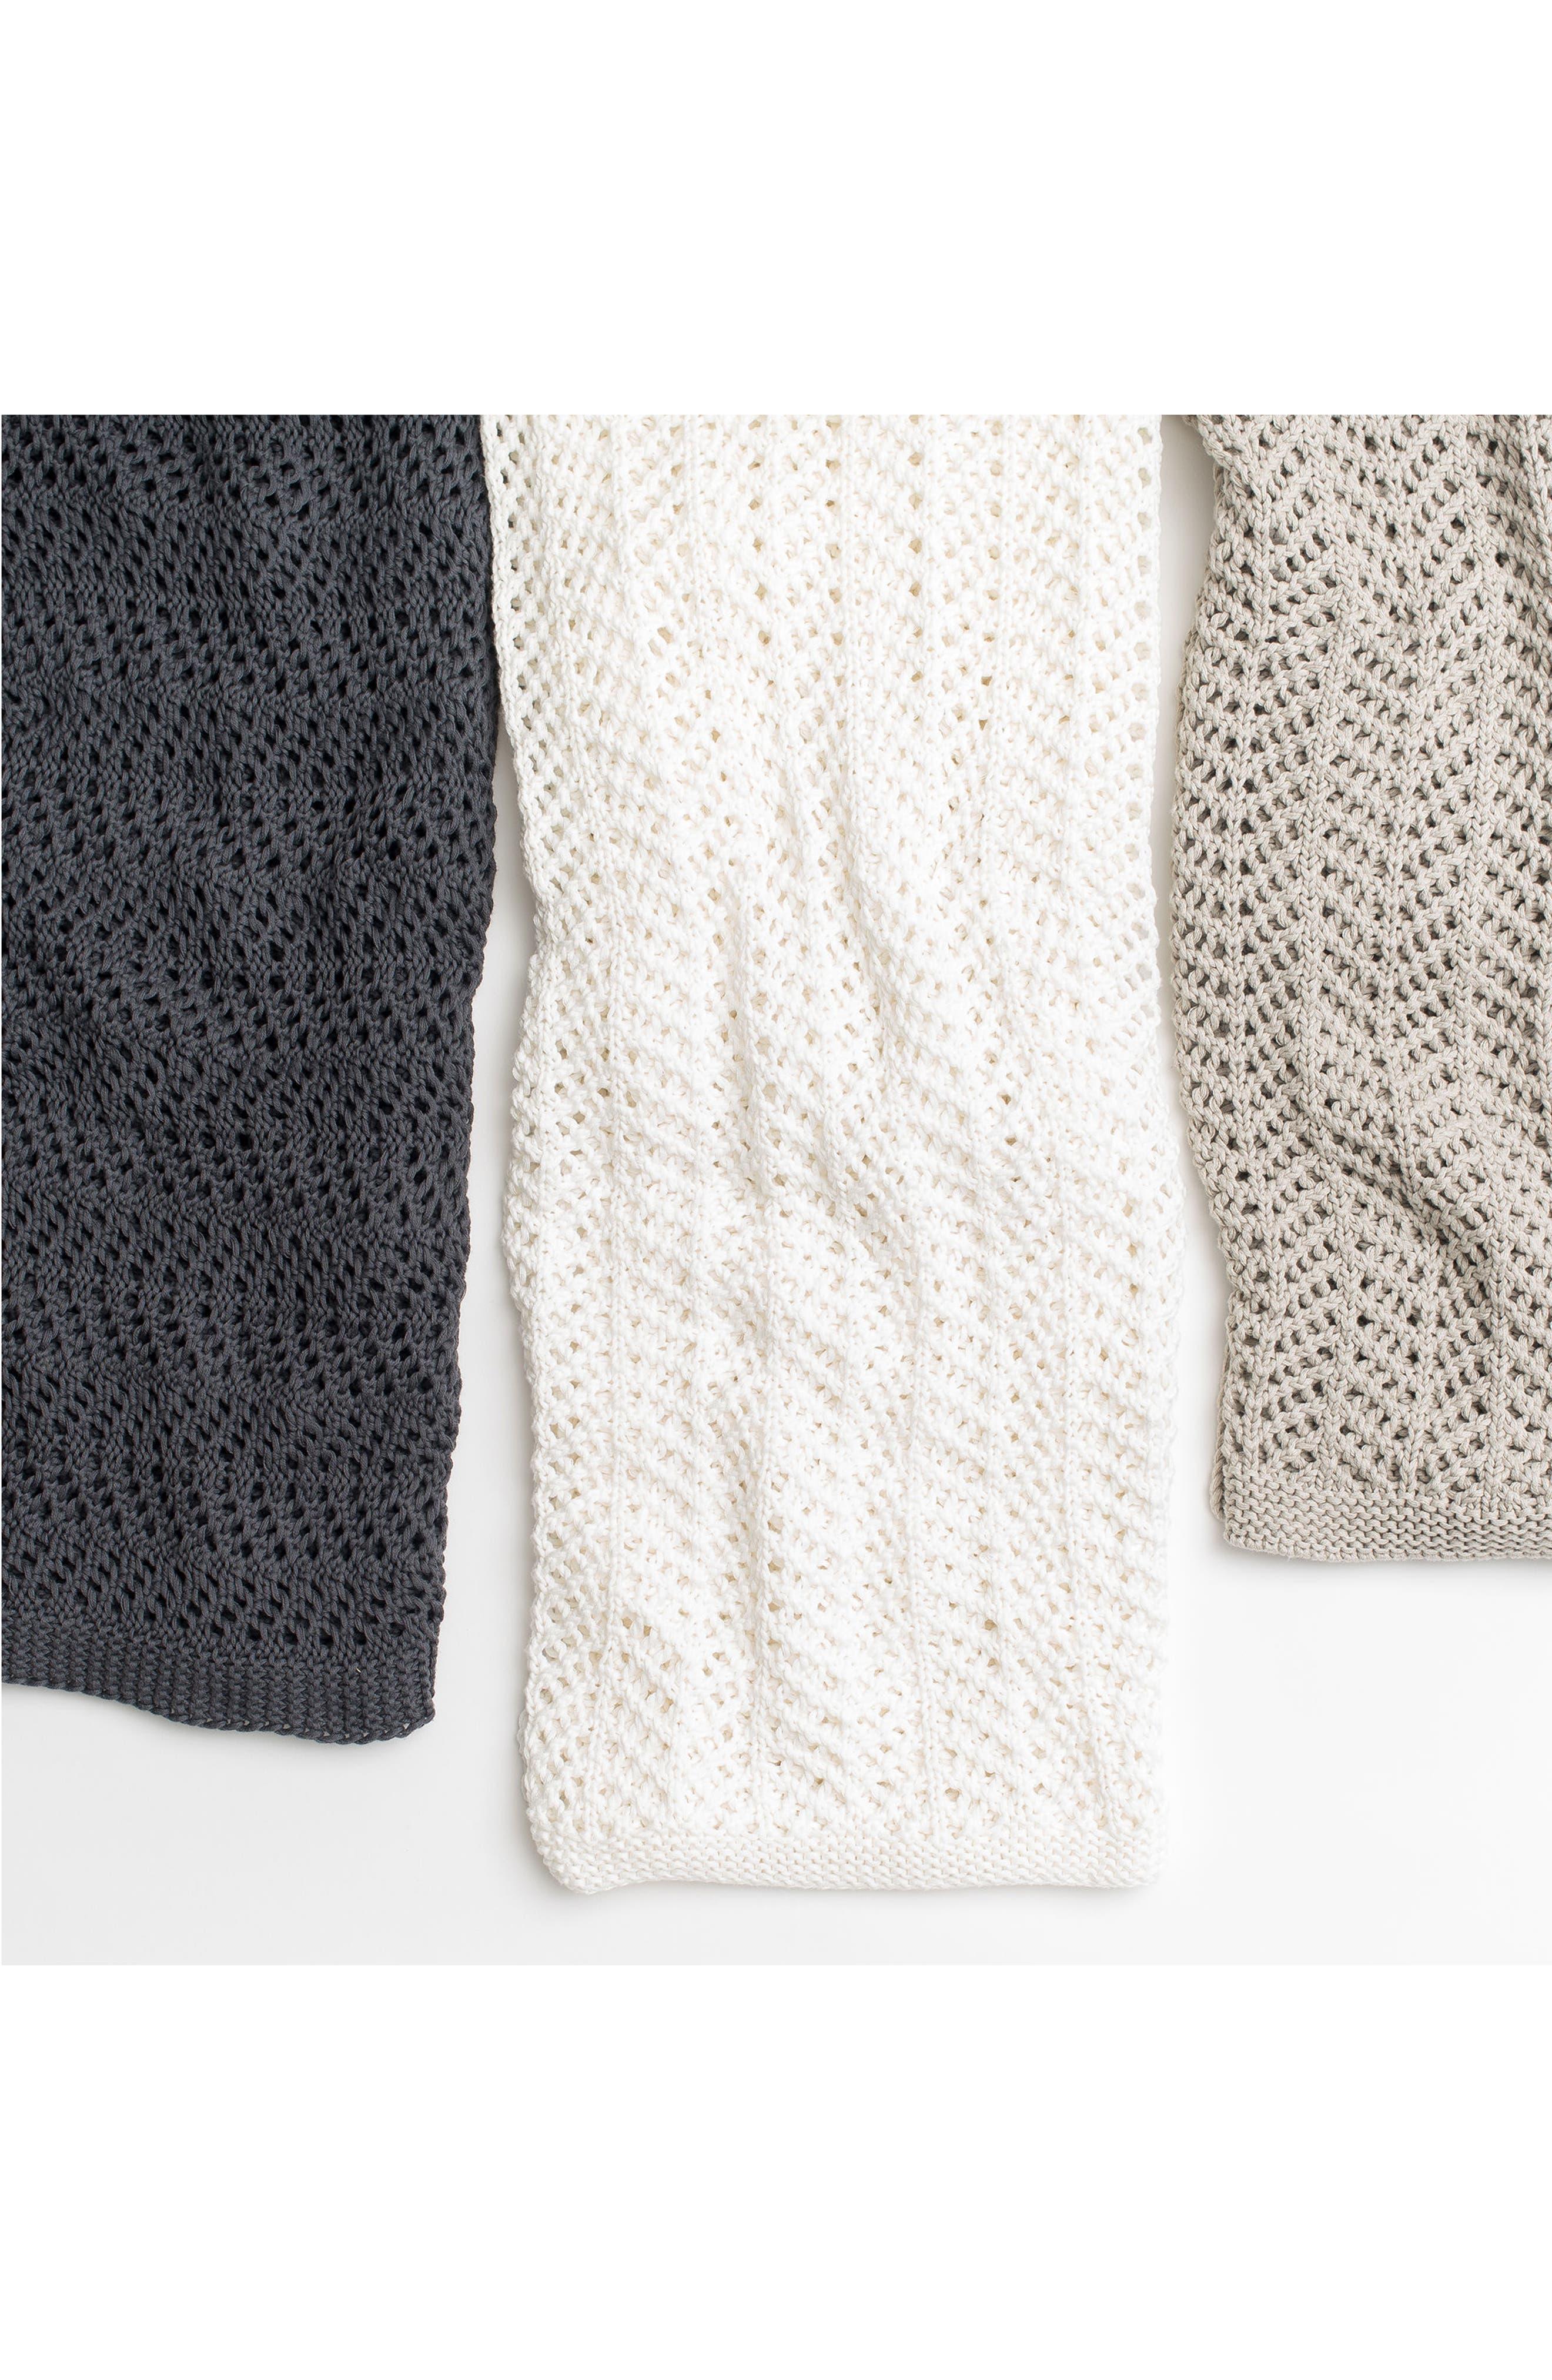 Organic Cotton Boho Knit Throw,                             Alternate thumbnail 2, color,                             010